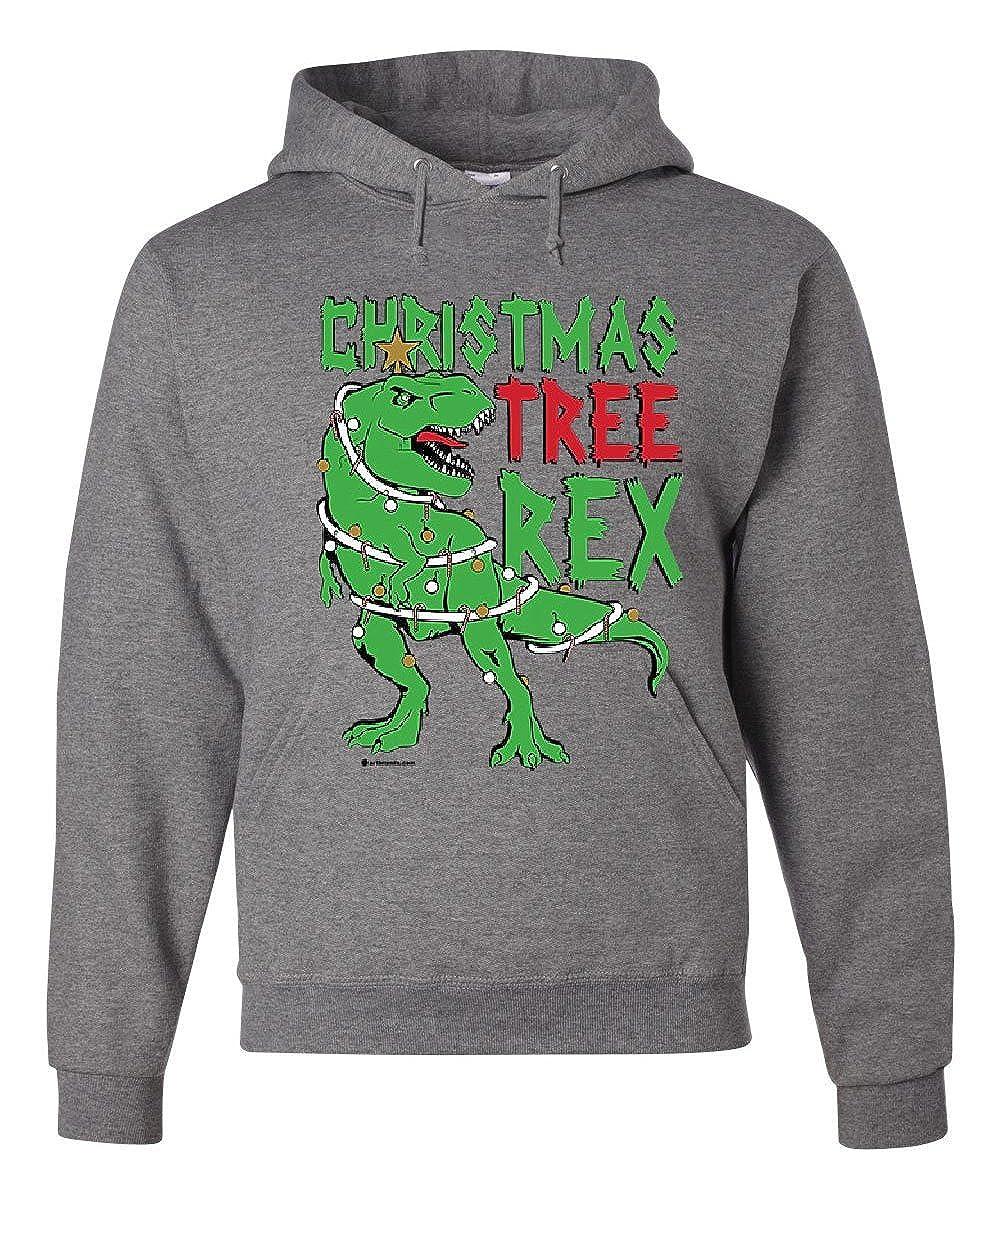 Tee Hunt Christmas Tree Rex Hoodie Funny T-Rex Xmas Tree Holidays Santa 105049-S